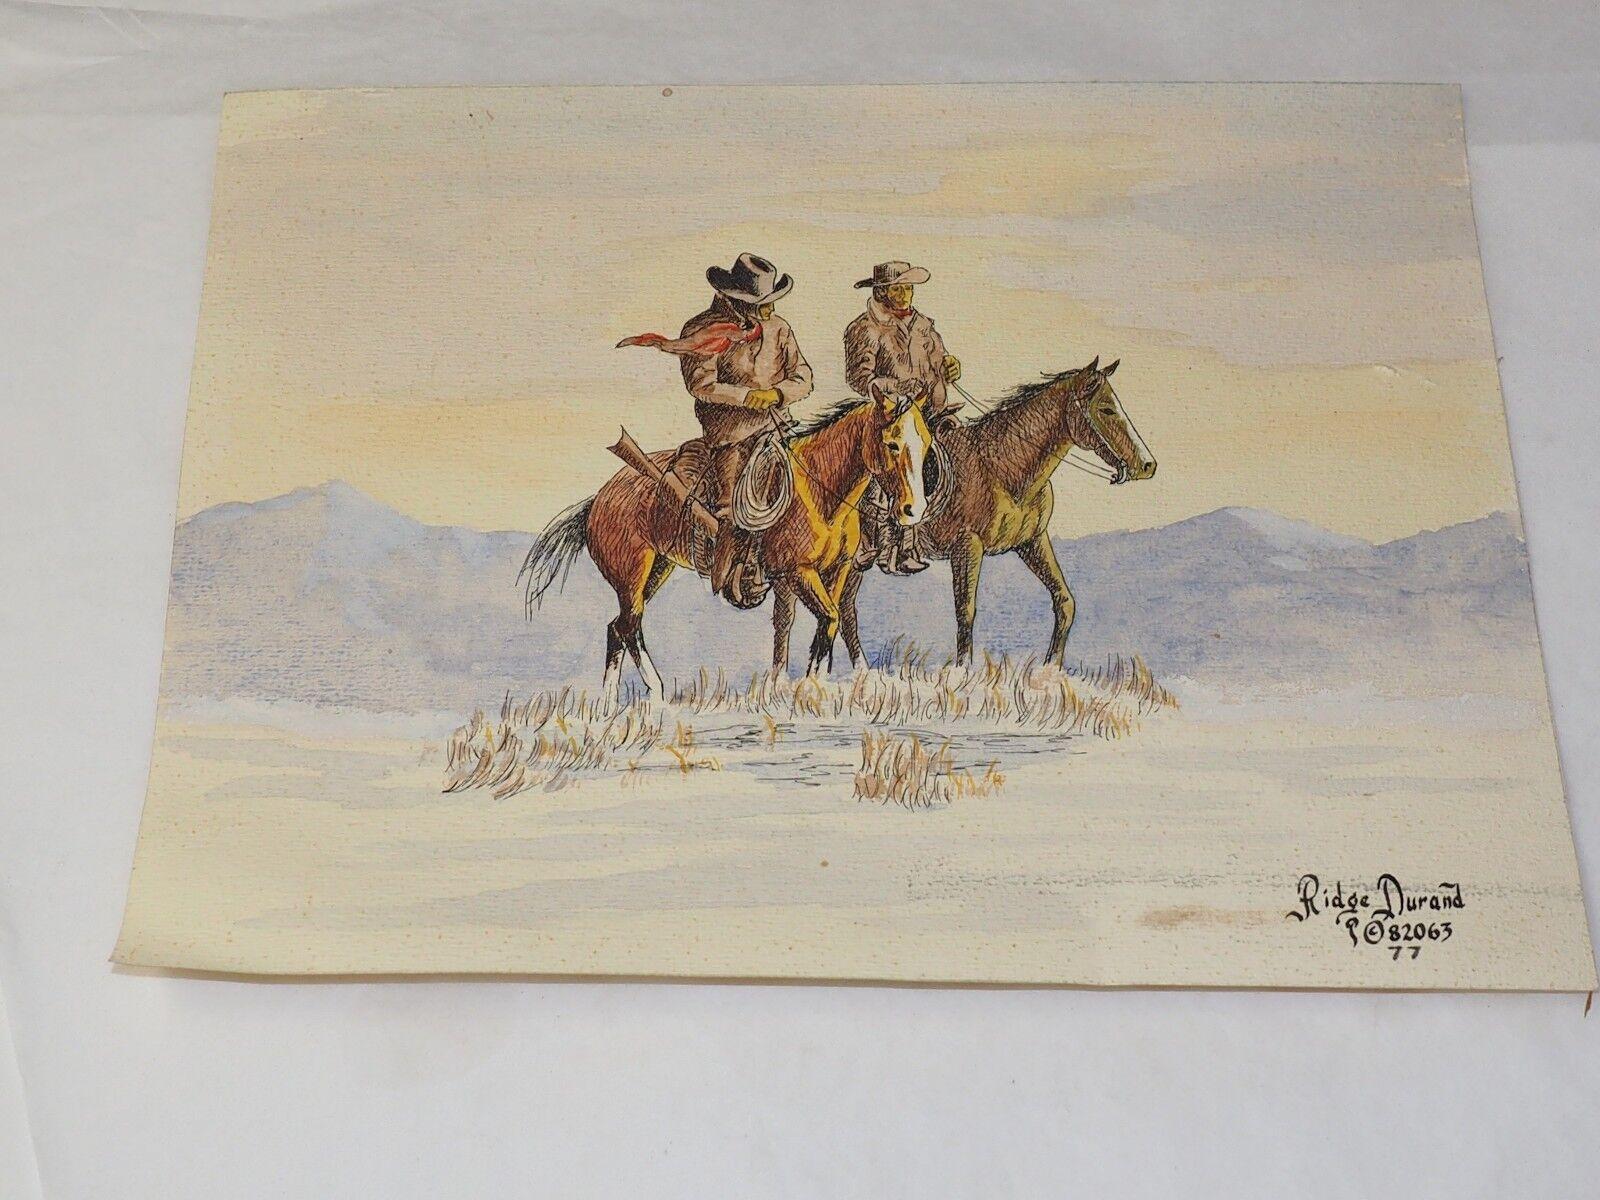 Original Ridge Warl Stylo Durand Aquarelle & Stylo Warl Lakota Indien Peinture 1977 62940e